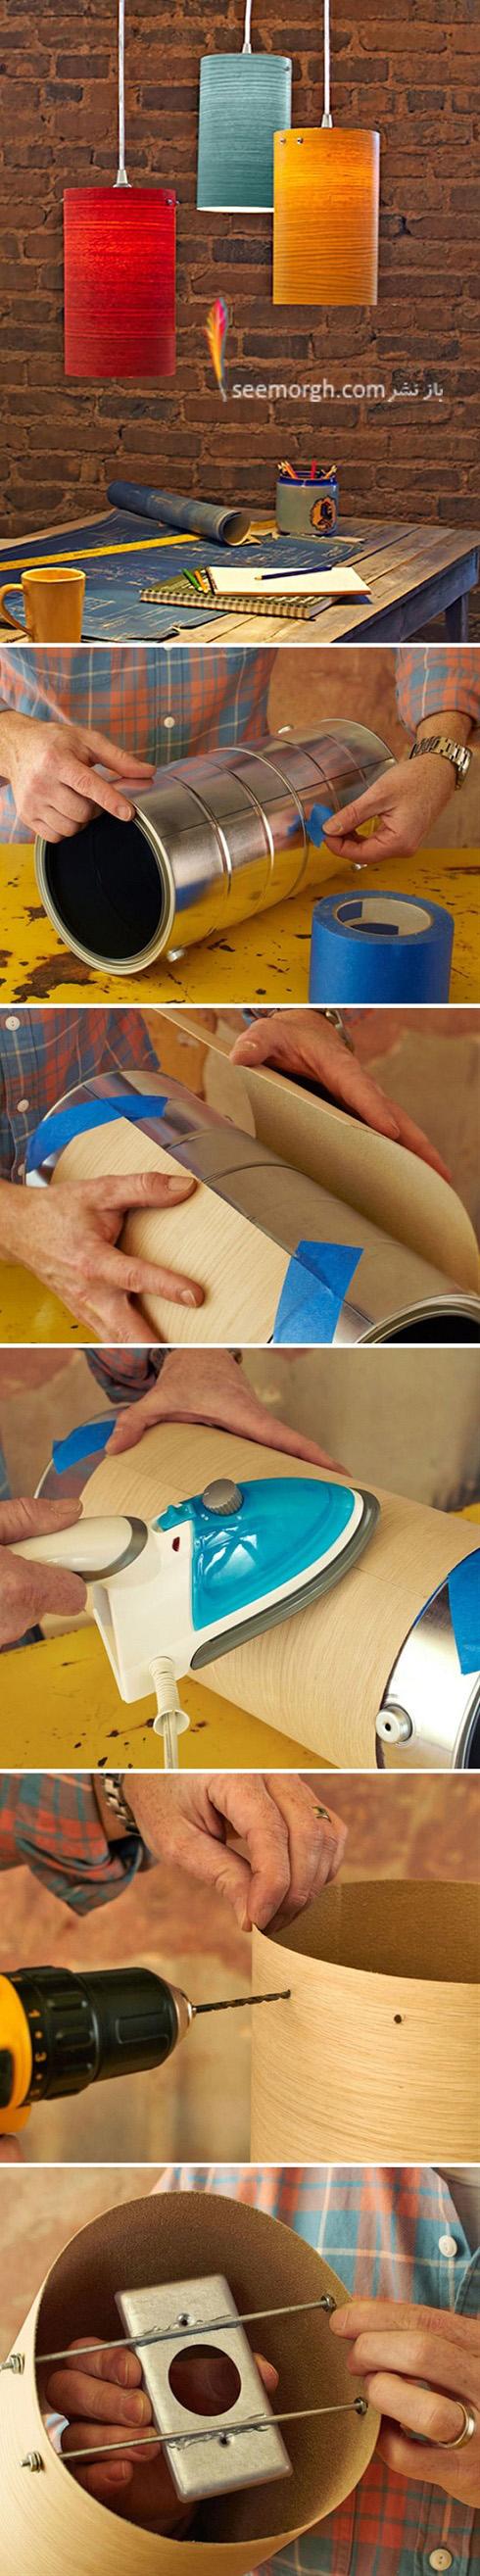 لوستر,ساخت لوستر,درست کردن لوستر,آموزش ساخت لوستر,ساخت لوستر در منزل,لوستر با روکش چوب